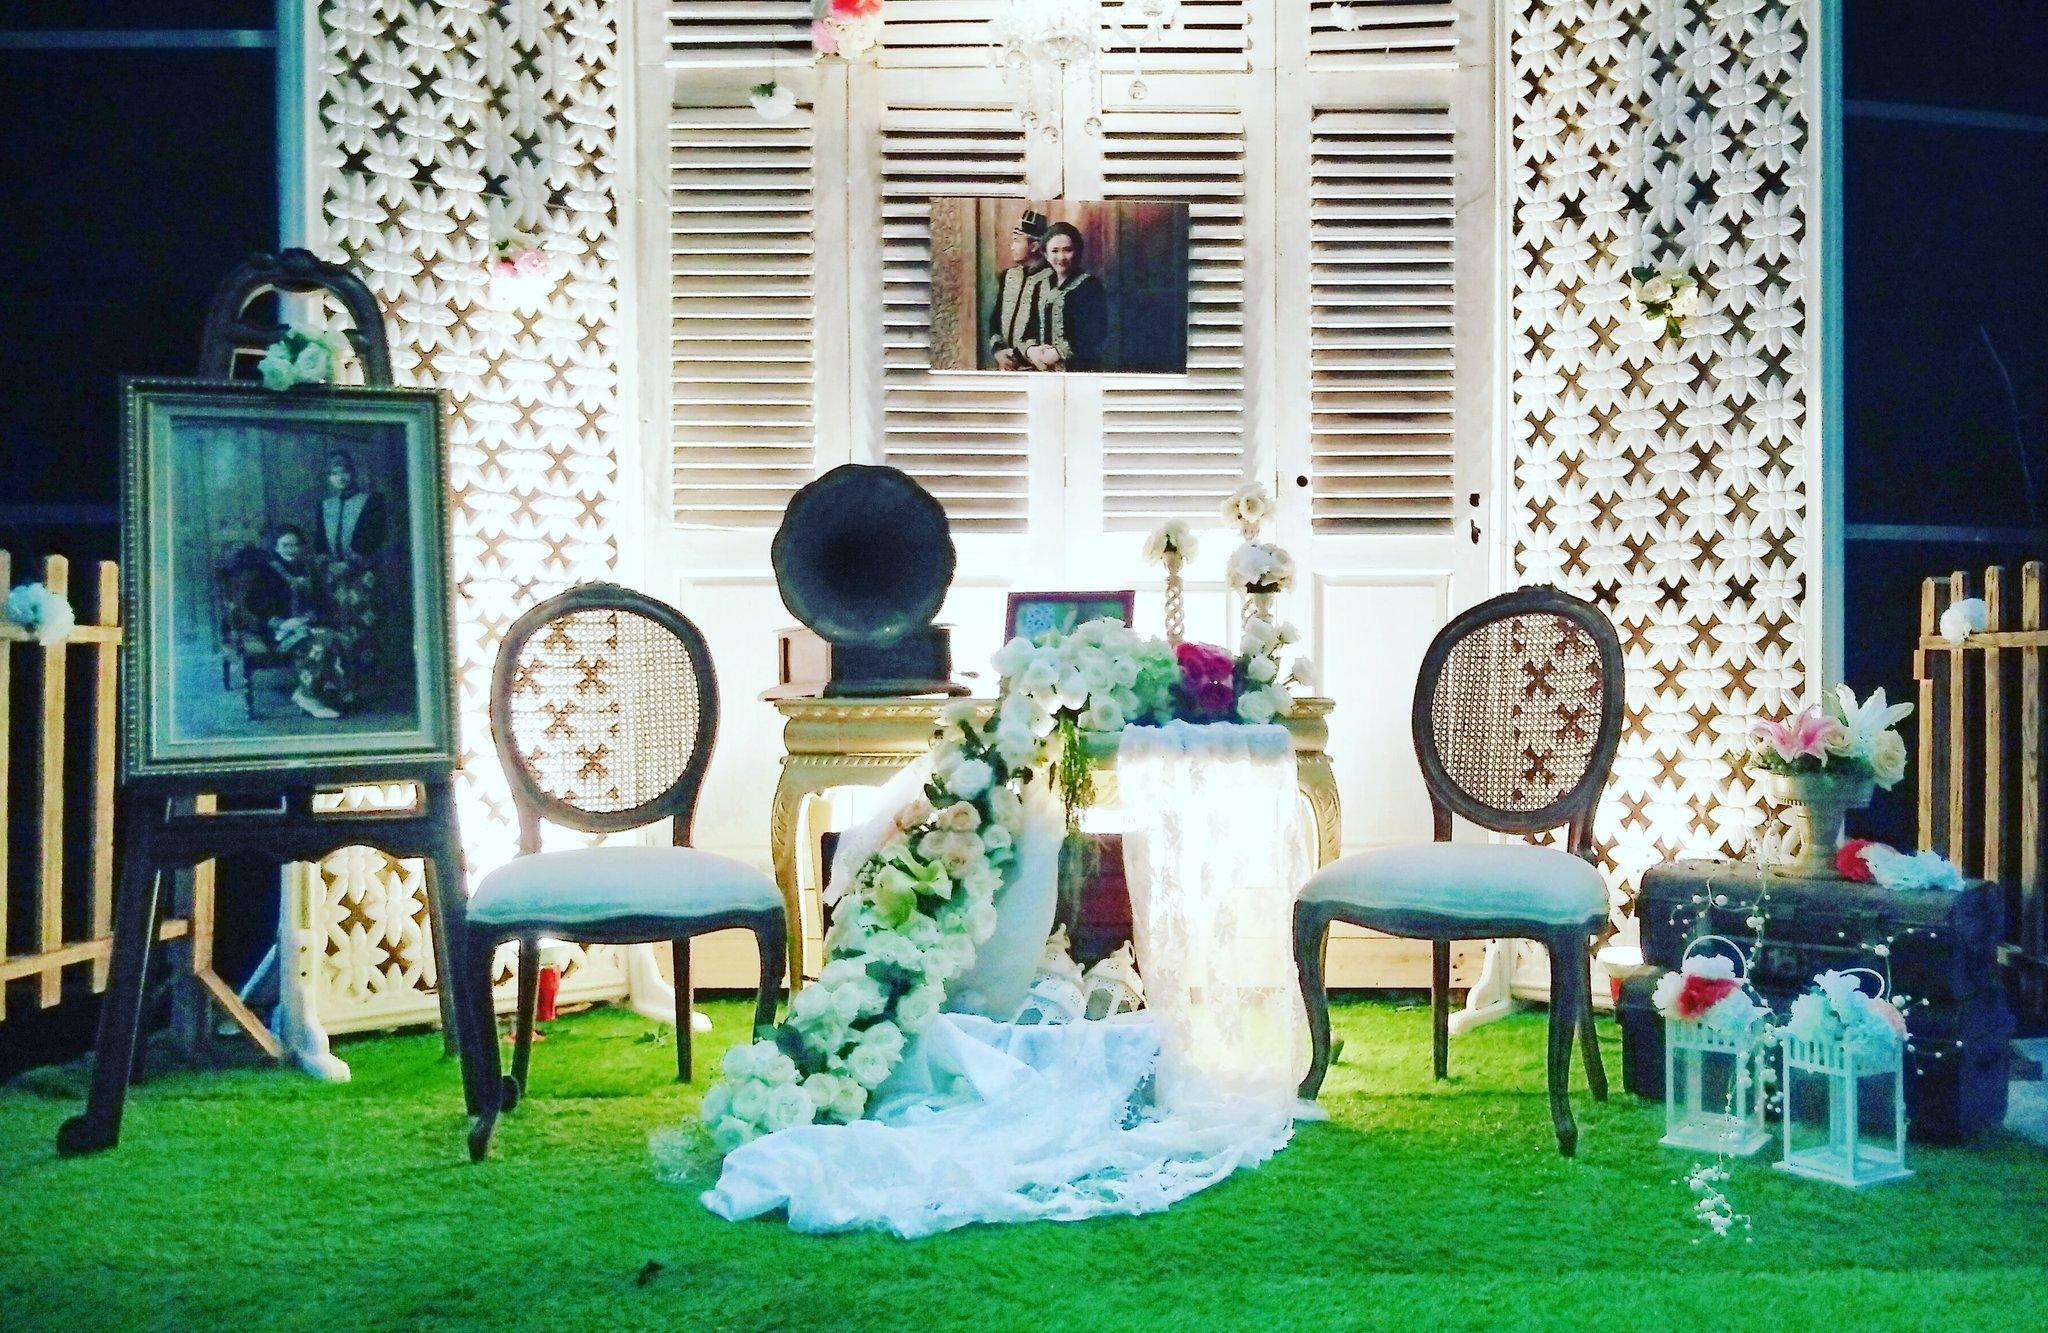 tiara dekorasi abadi on twitter vintage photo booth design decoration weddingdecoration. Black Bedroom Furniture Sets. Home Design Ideas